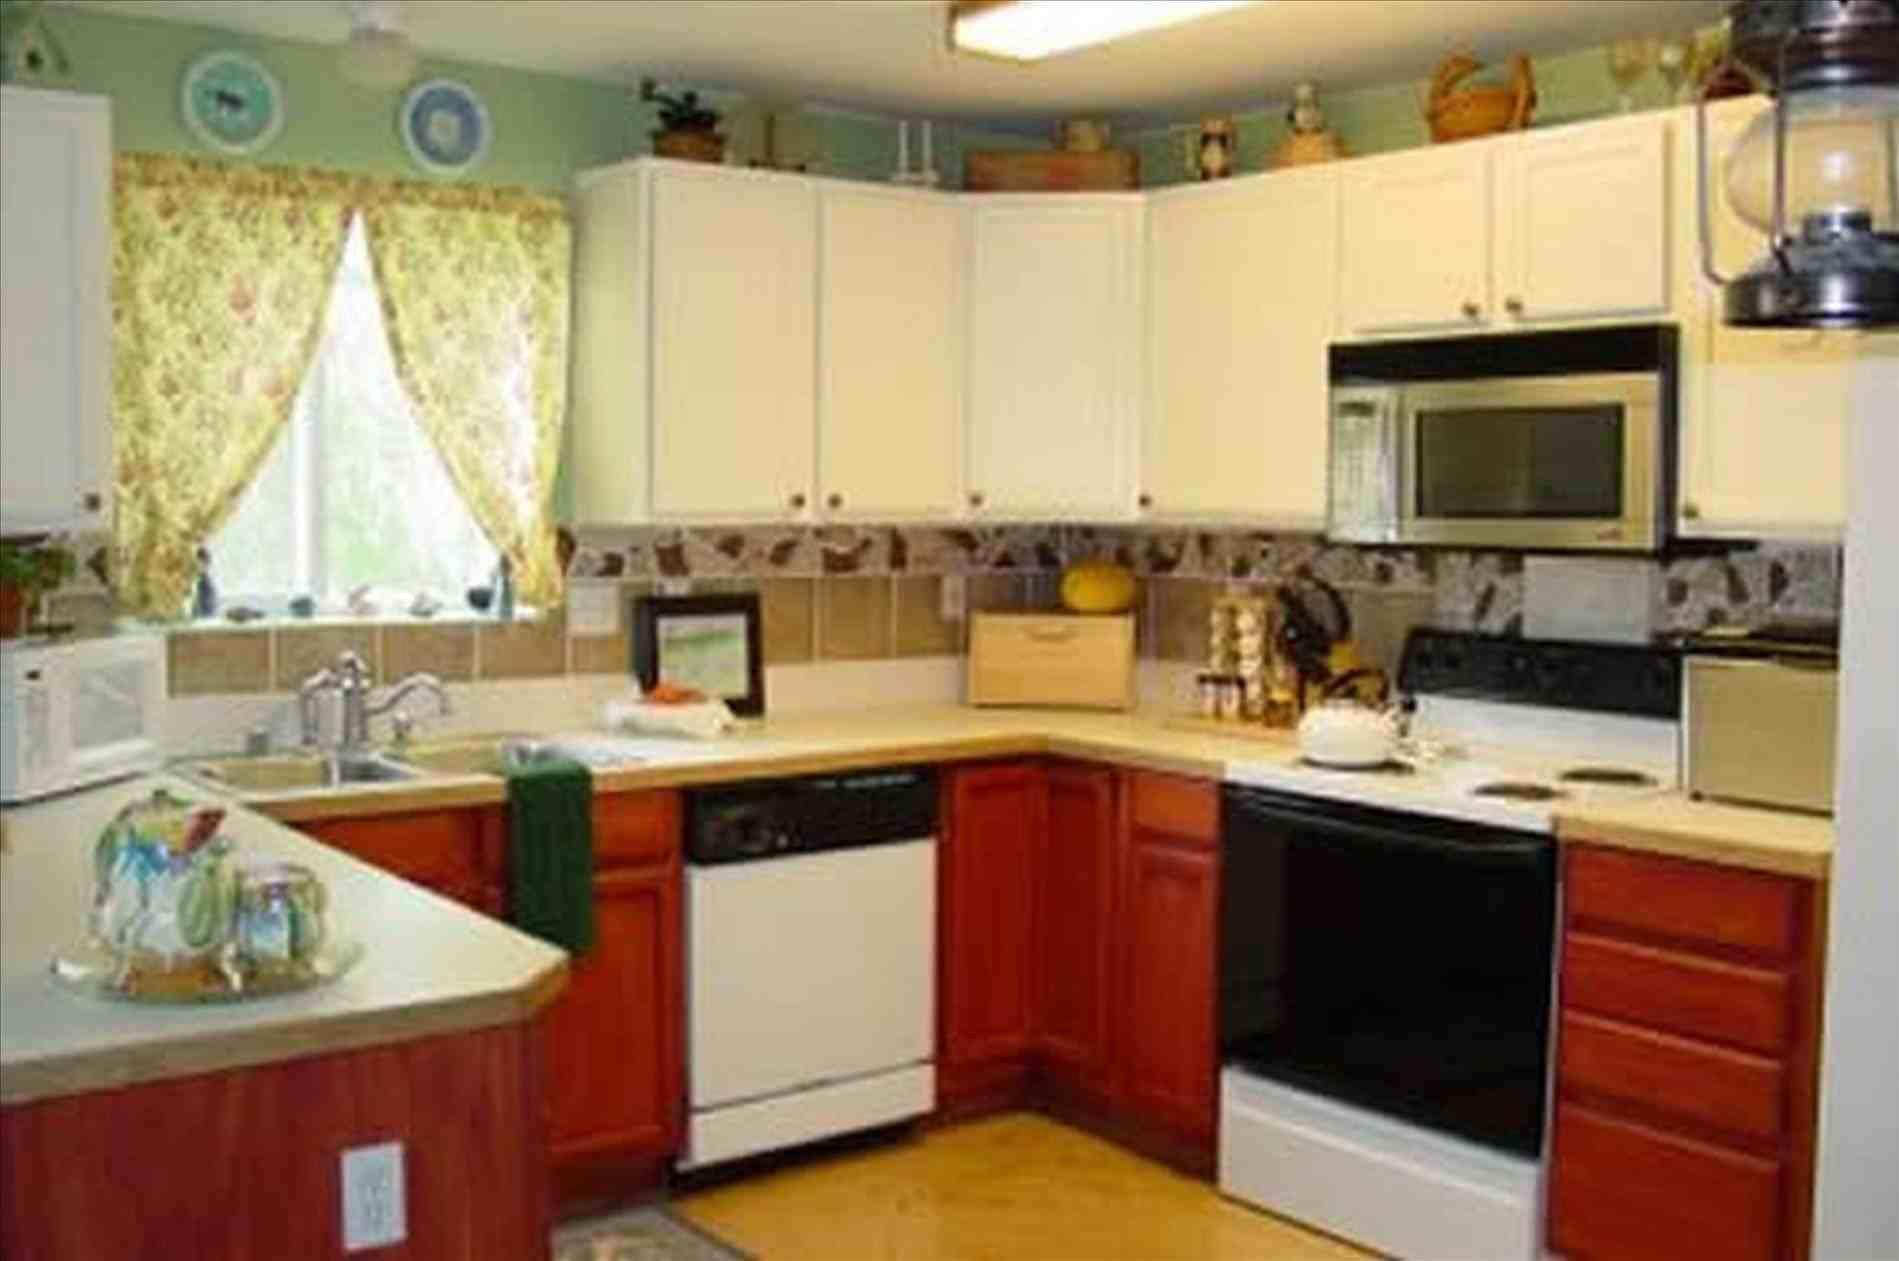 Kitchen Decorating Ideas On A Budget | Pinterest | Kitchen decor ...